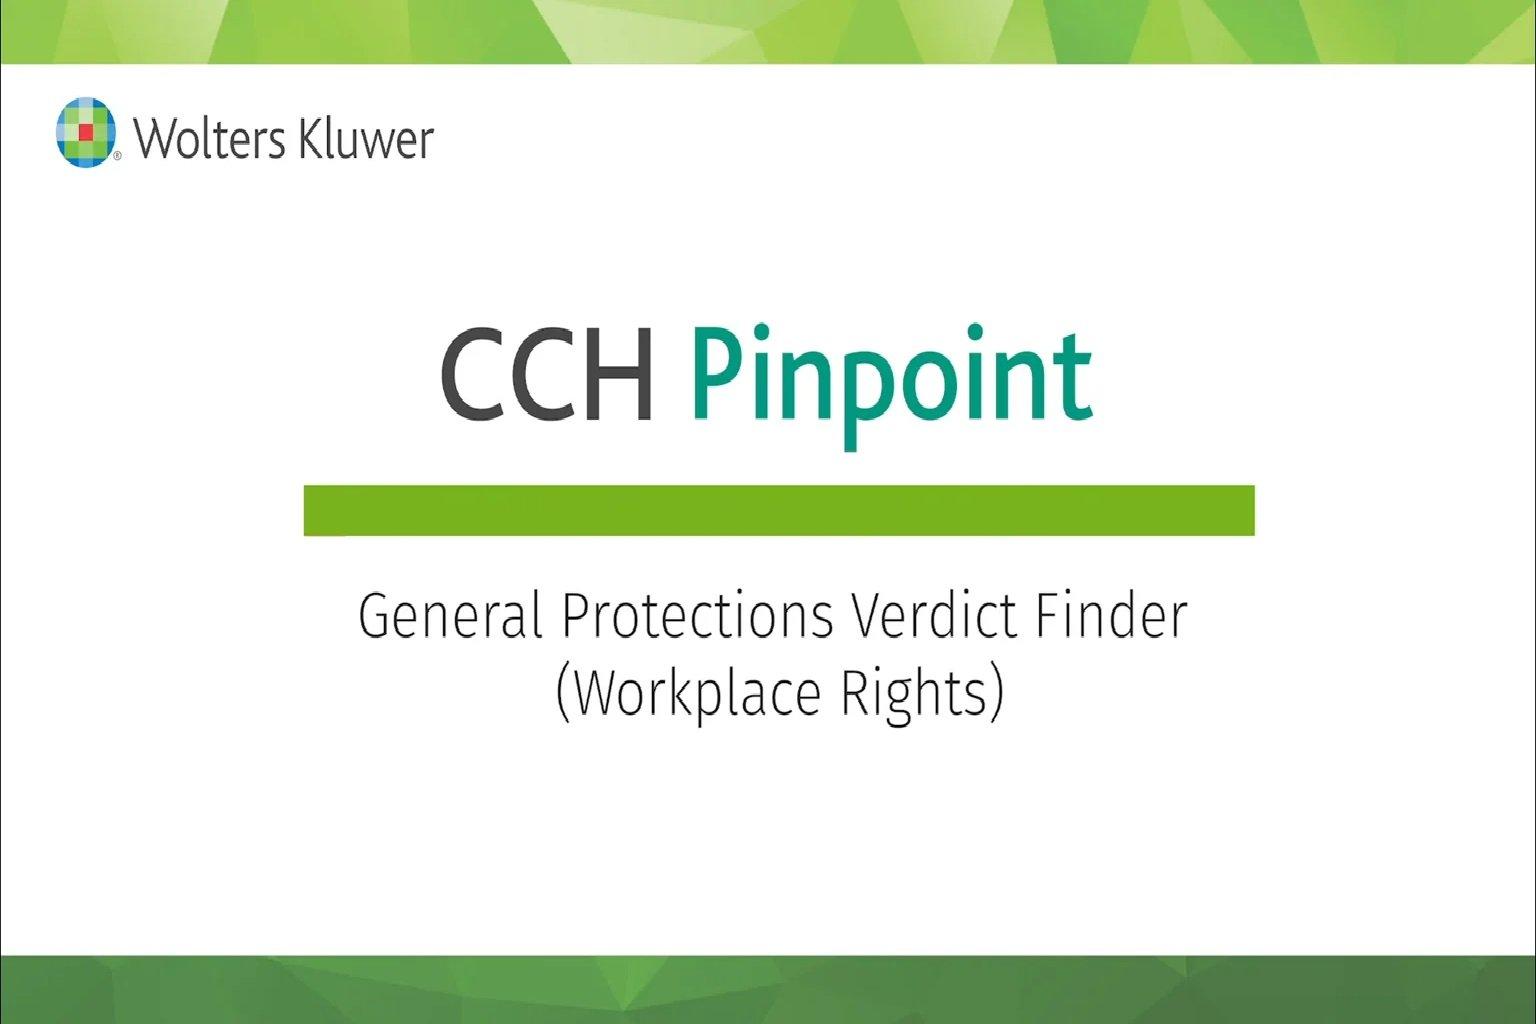 General Protections Verdict Finder